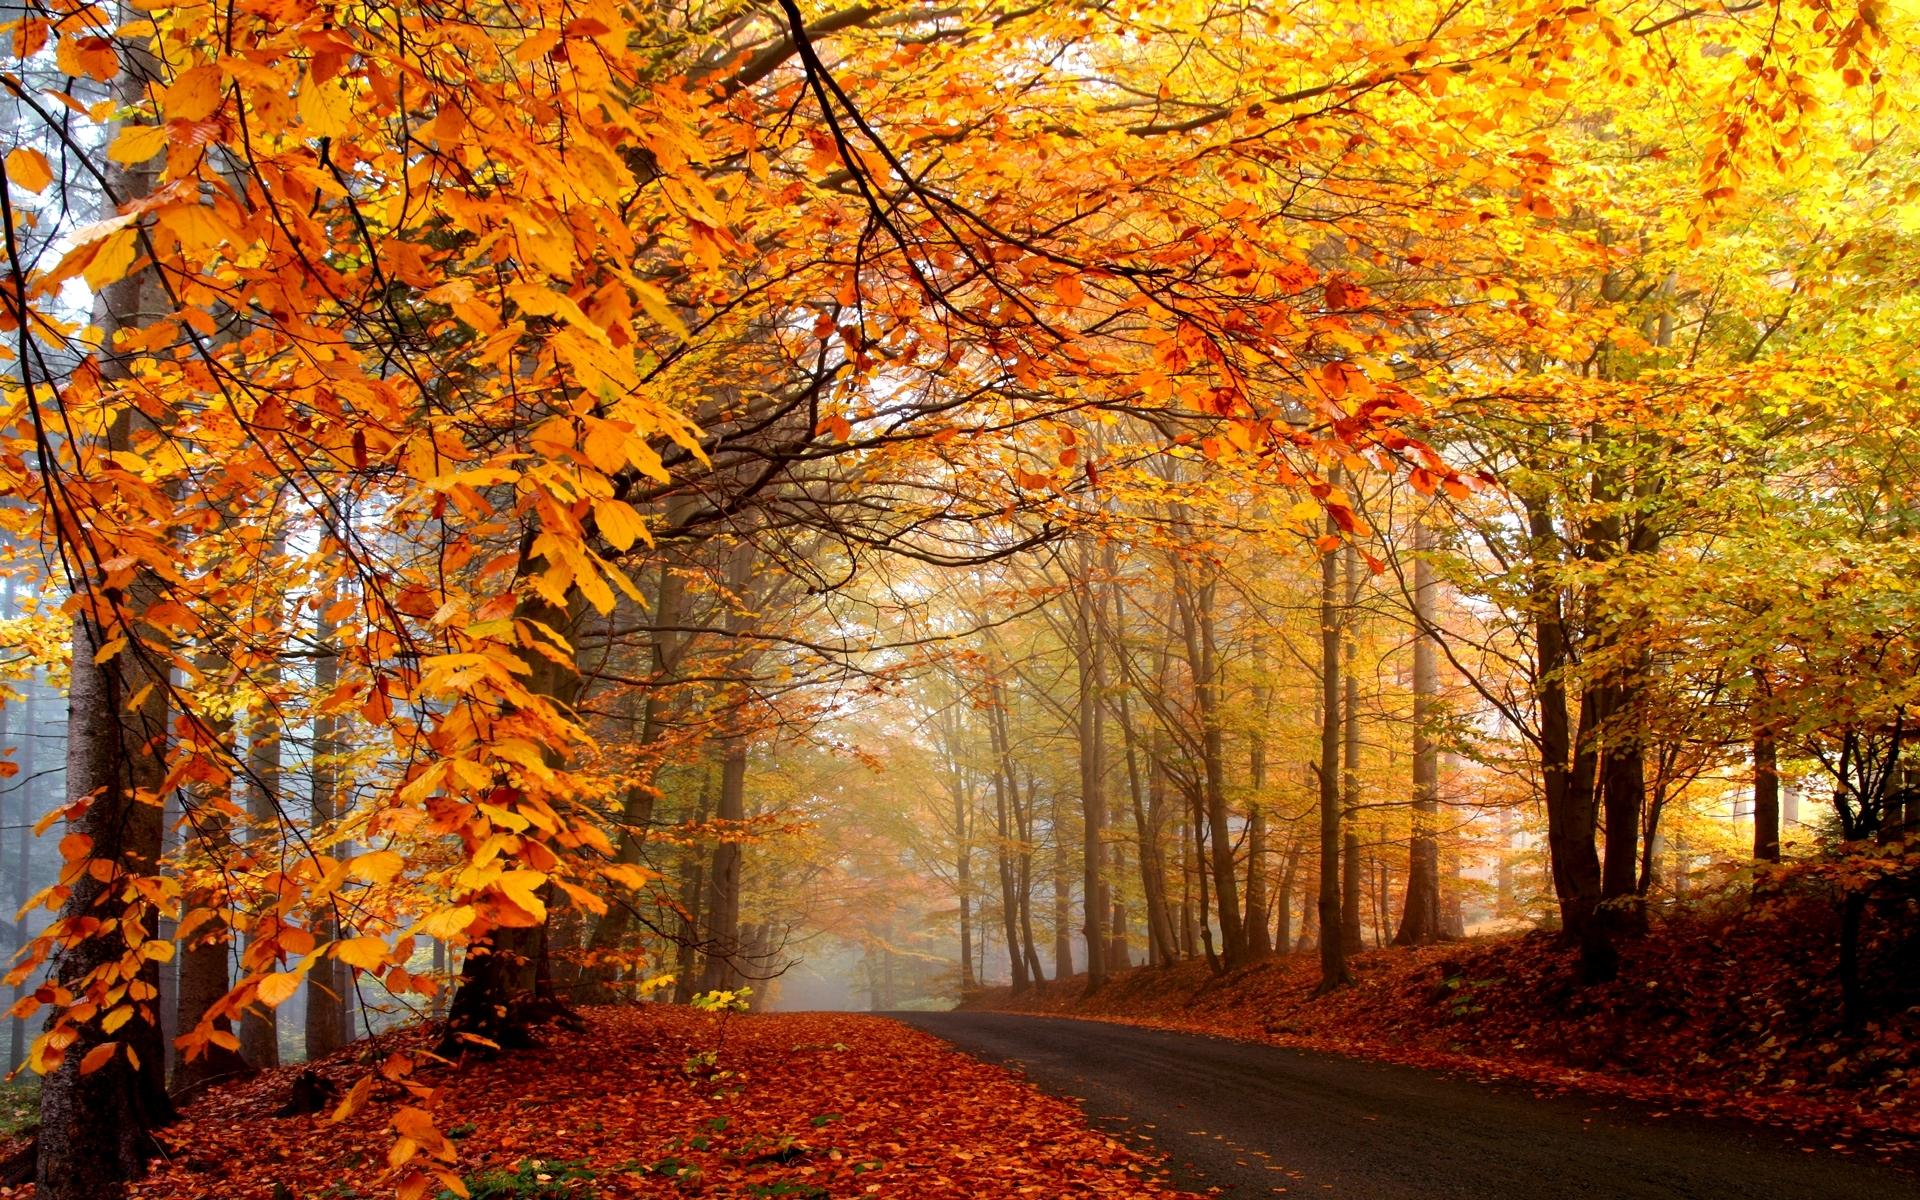 Autumn road clipart.